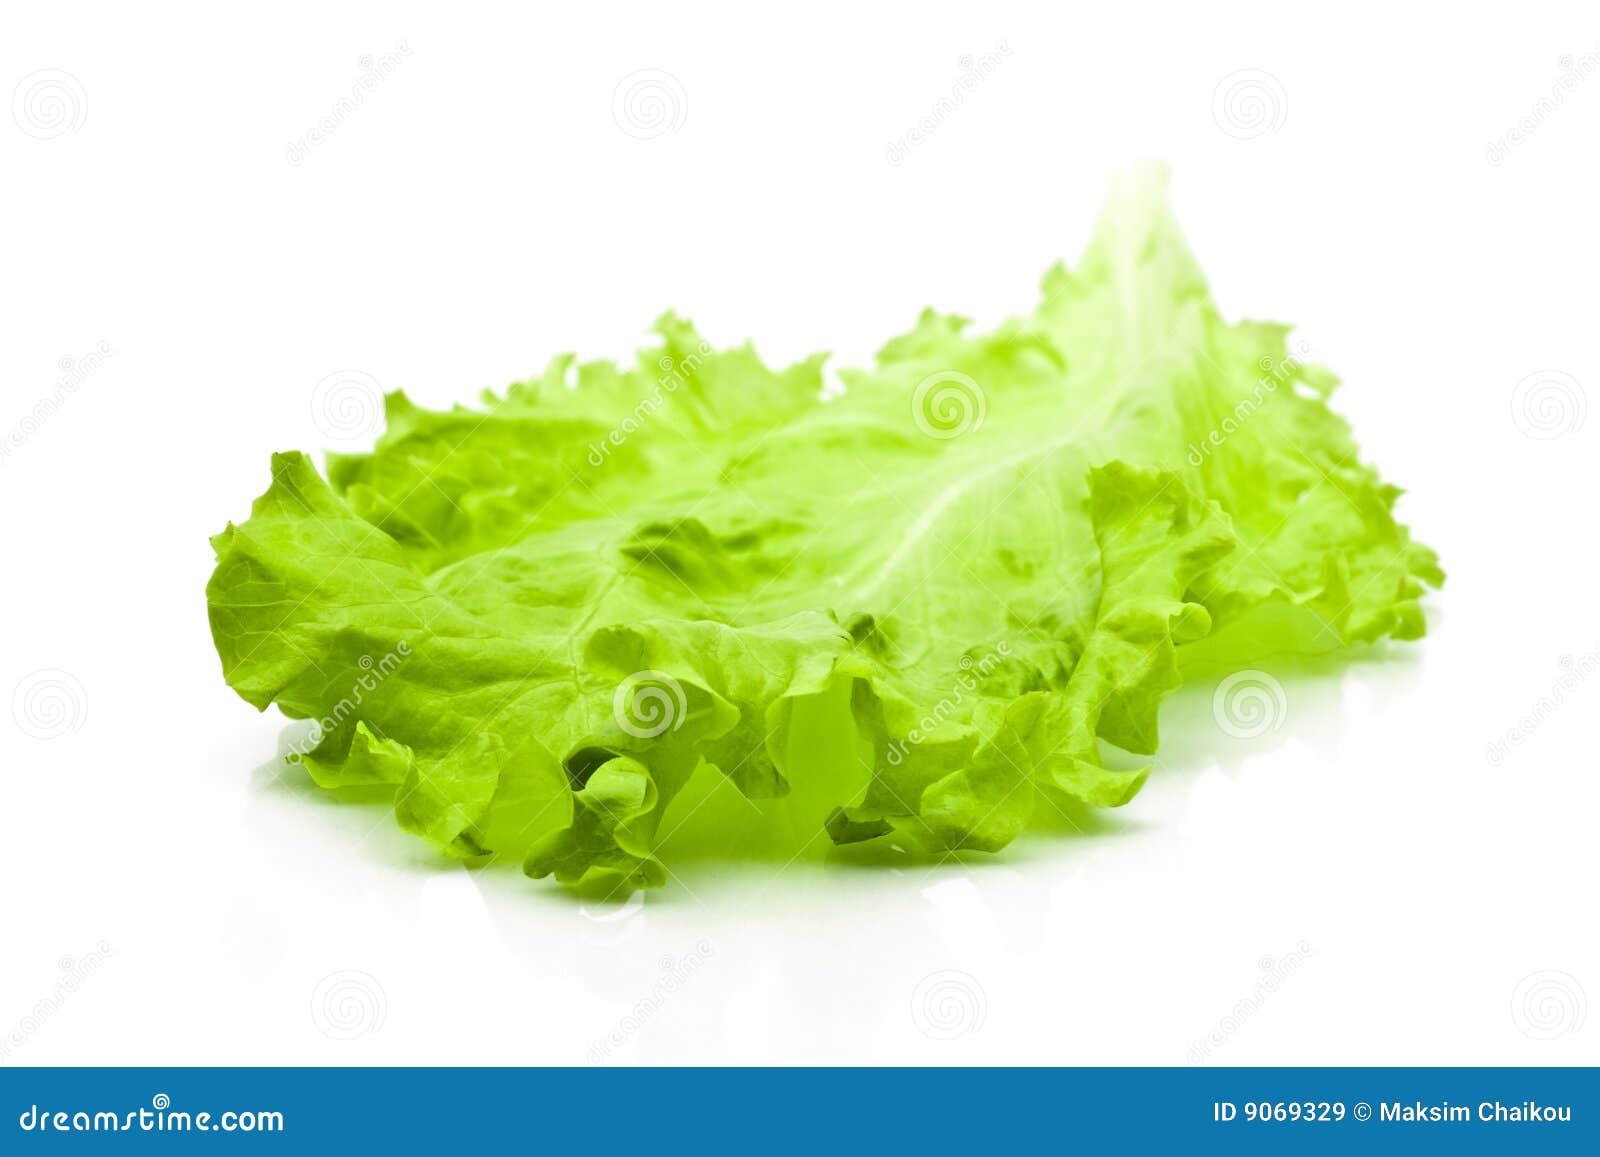 green leaf lettuce royalty free stock images   image 9069329